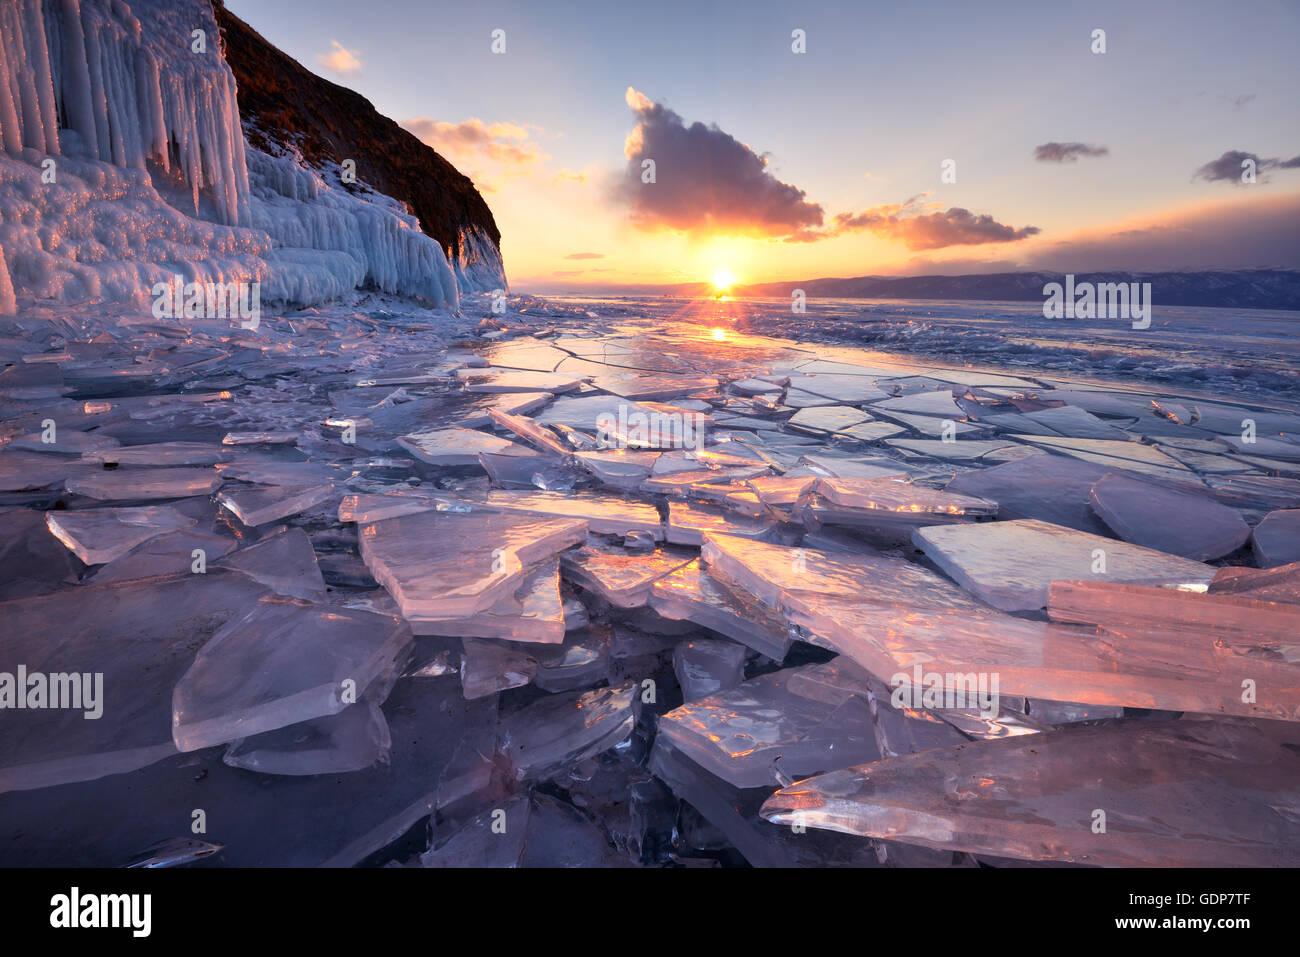 Broken ice at sunset, Baikal Lake, Olkhon Island, Siberia, Russia - Stock Image